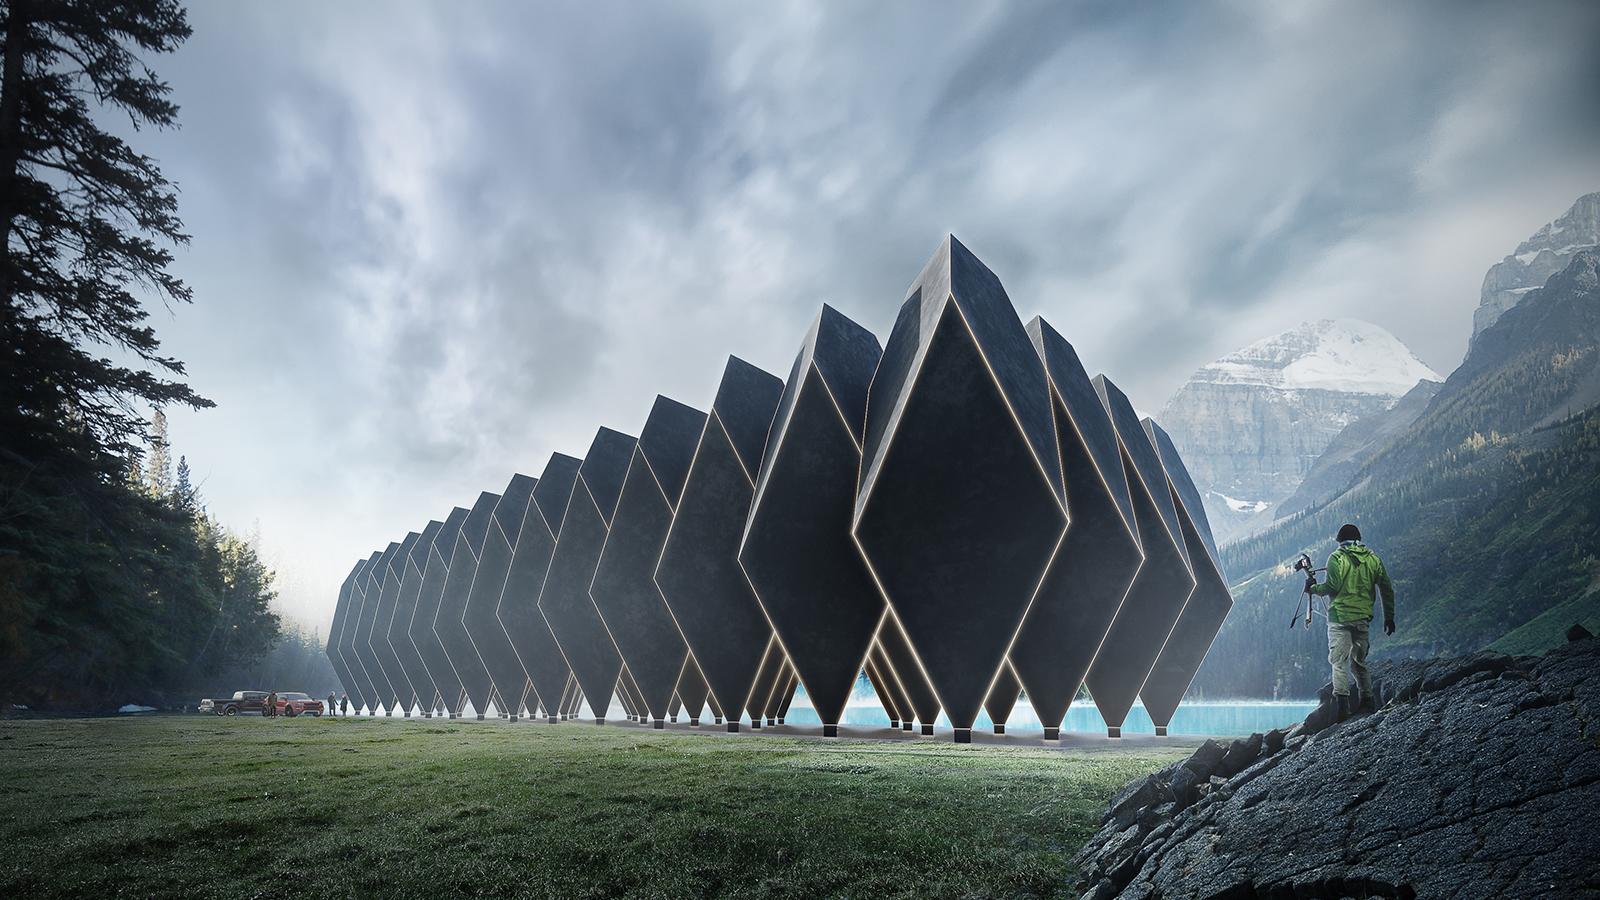 H tel futuriste cherche site d exception art de vivre for Cherche hotel